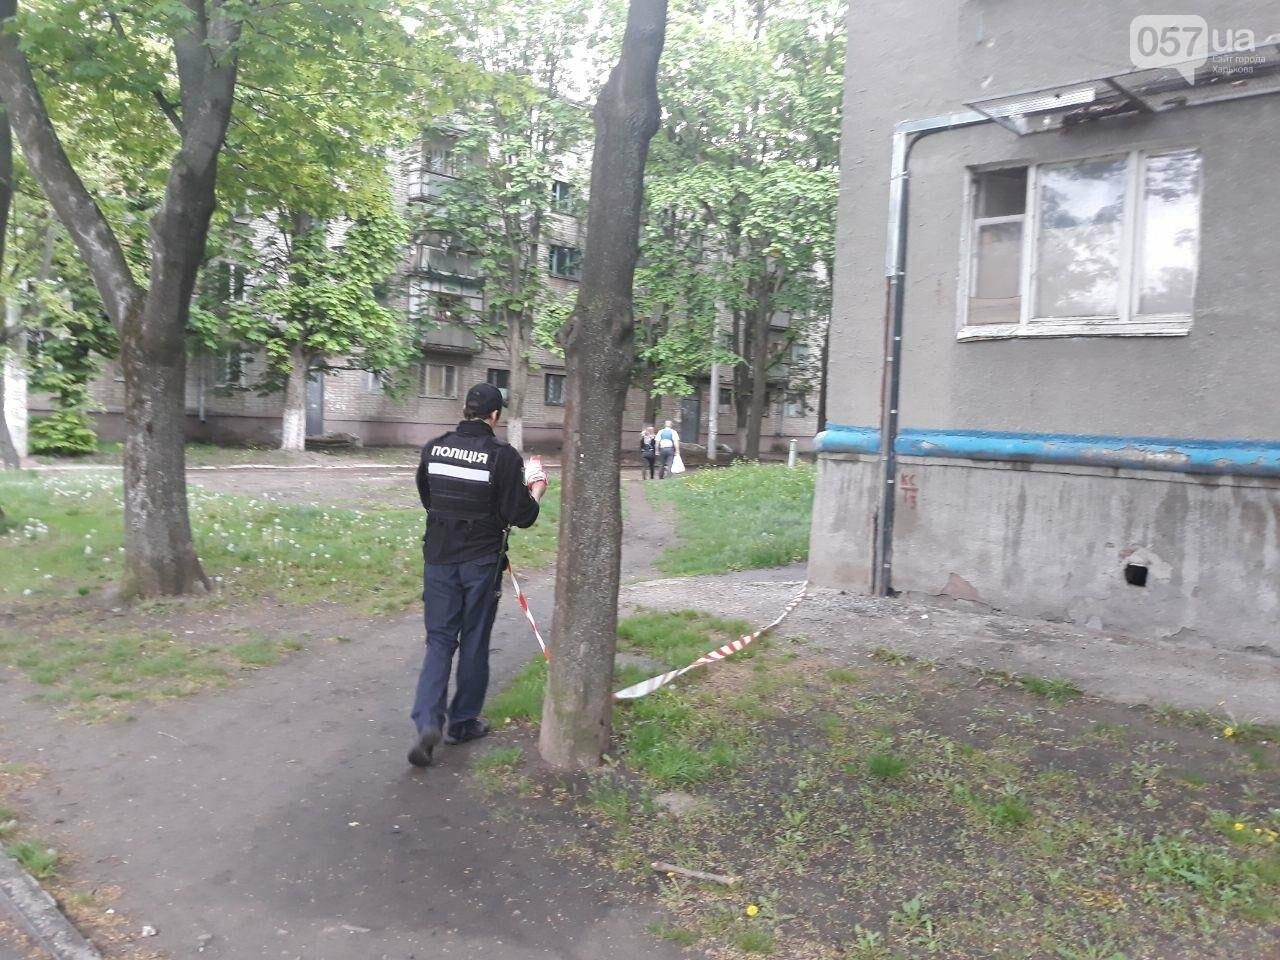 В Харькове силовики оцепили «пятиэтажку» и искали взрывчатку, - ФОТО, фото-6